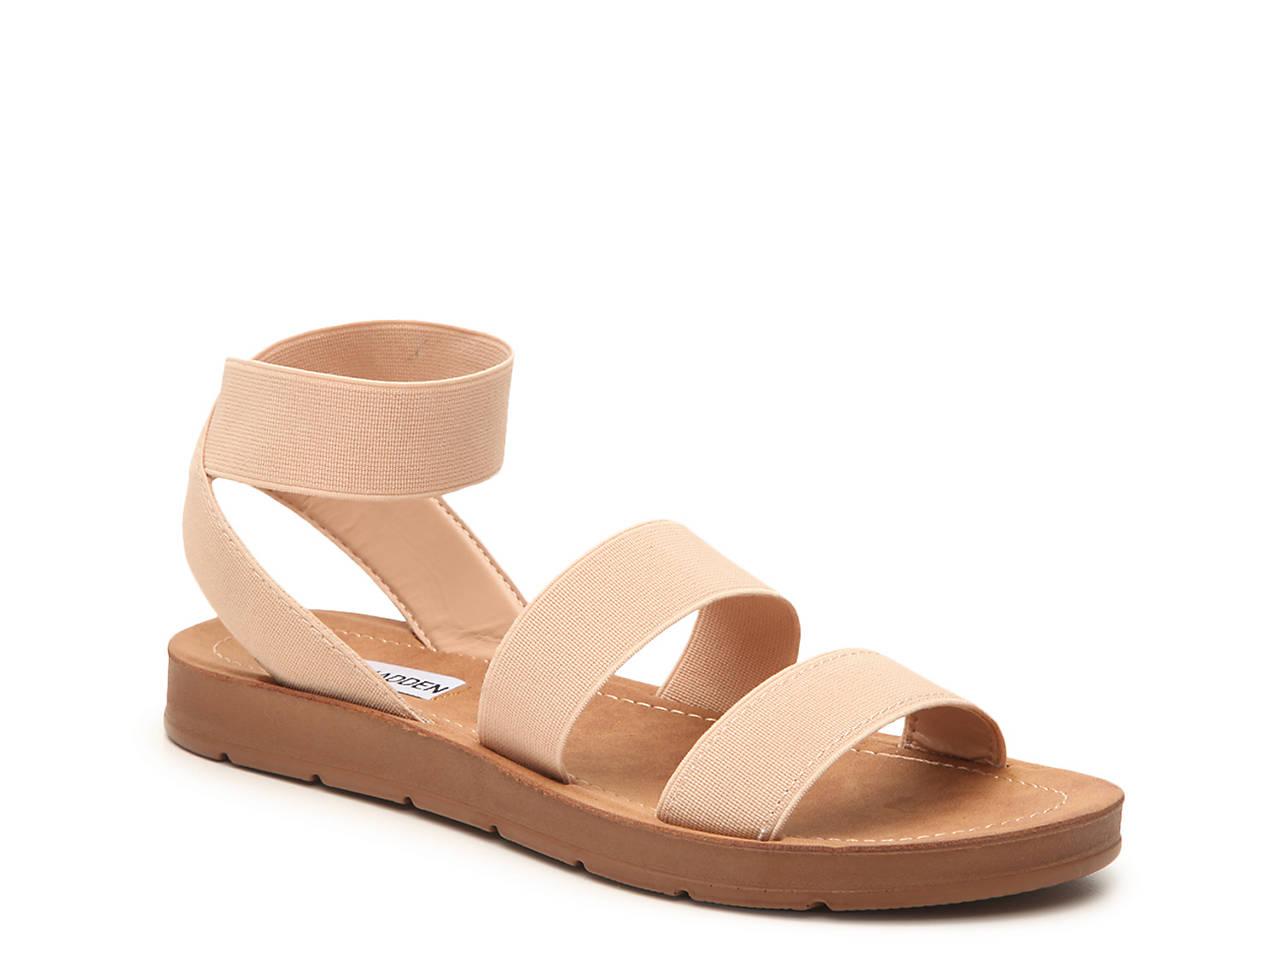 fd620dcfd68 Raffy Sandal